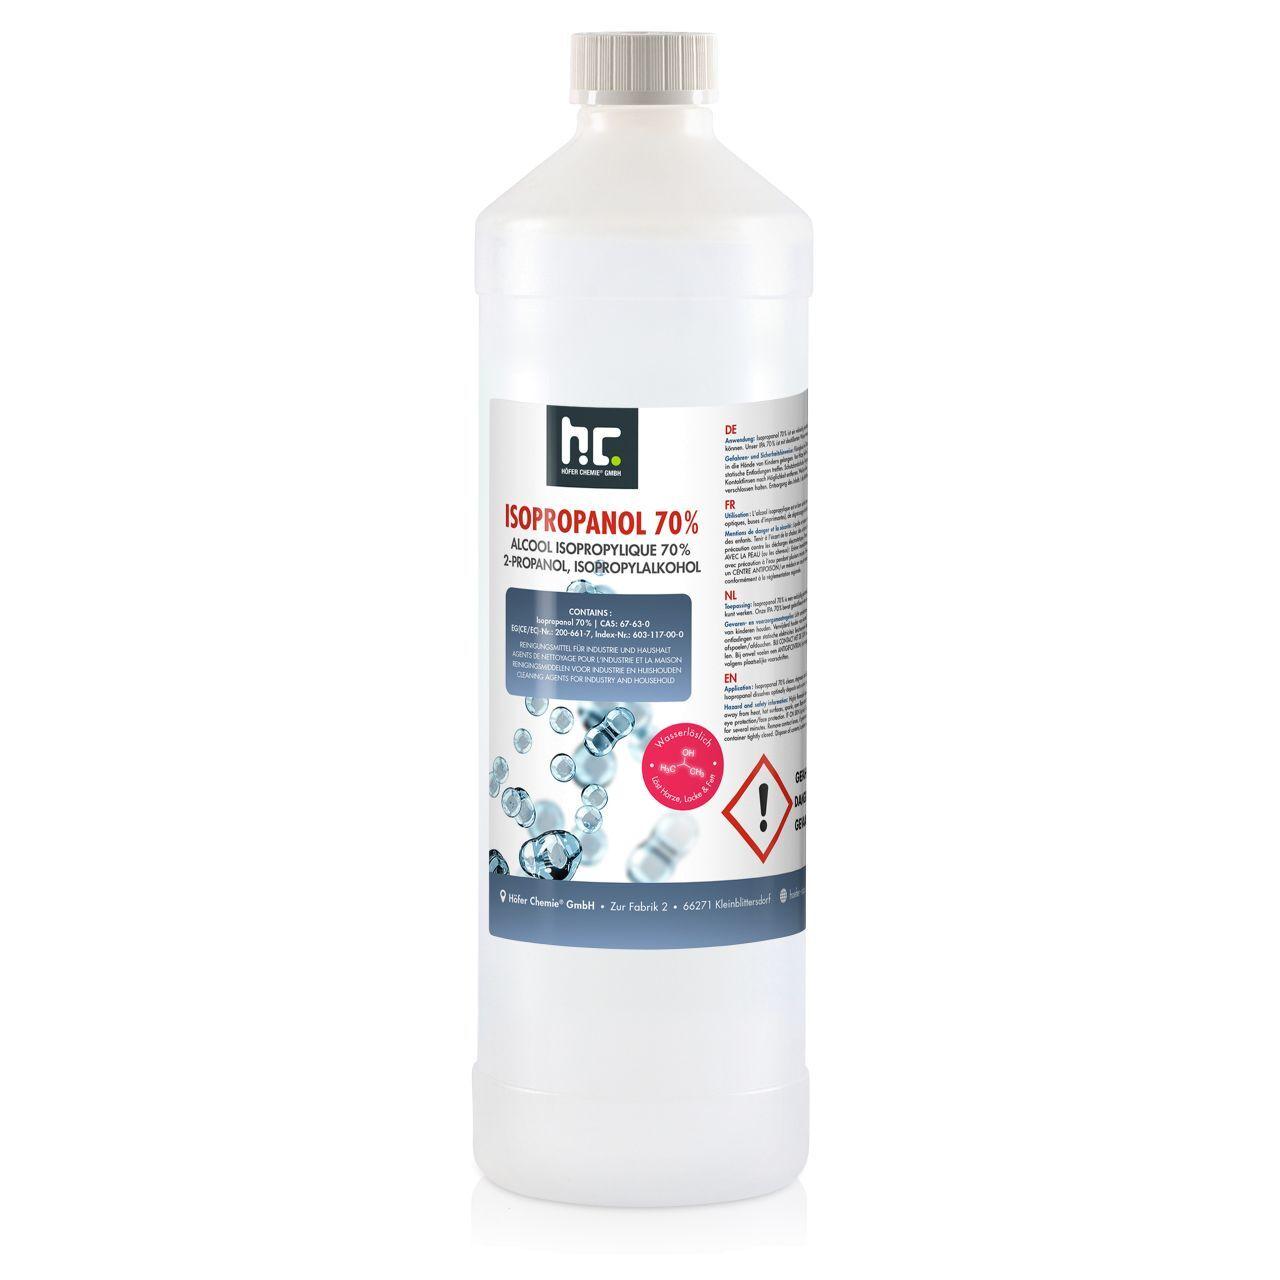 Höfer Chemie 15 l alcool isopropylique 70% (15 x 1 l)